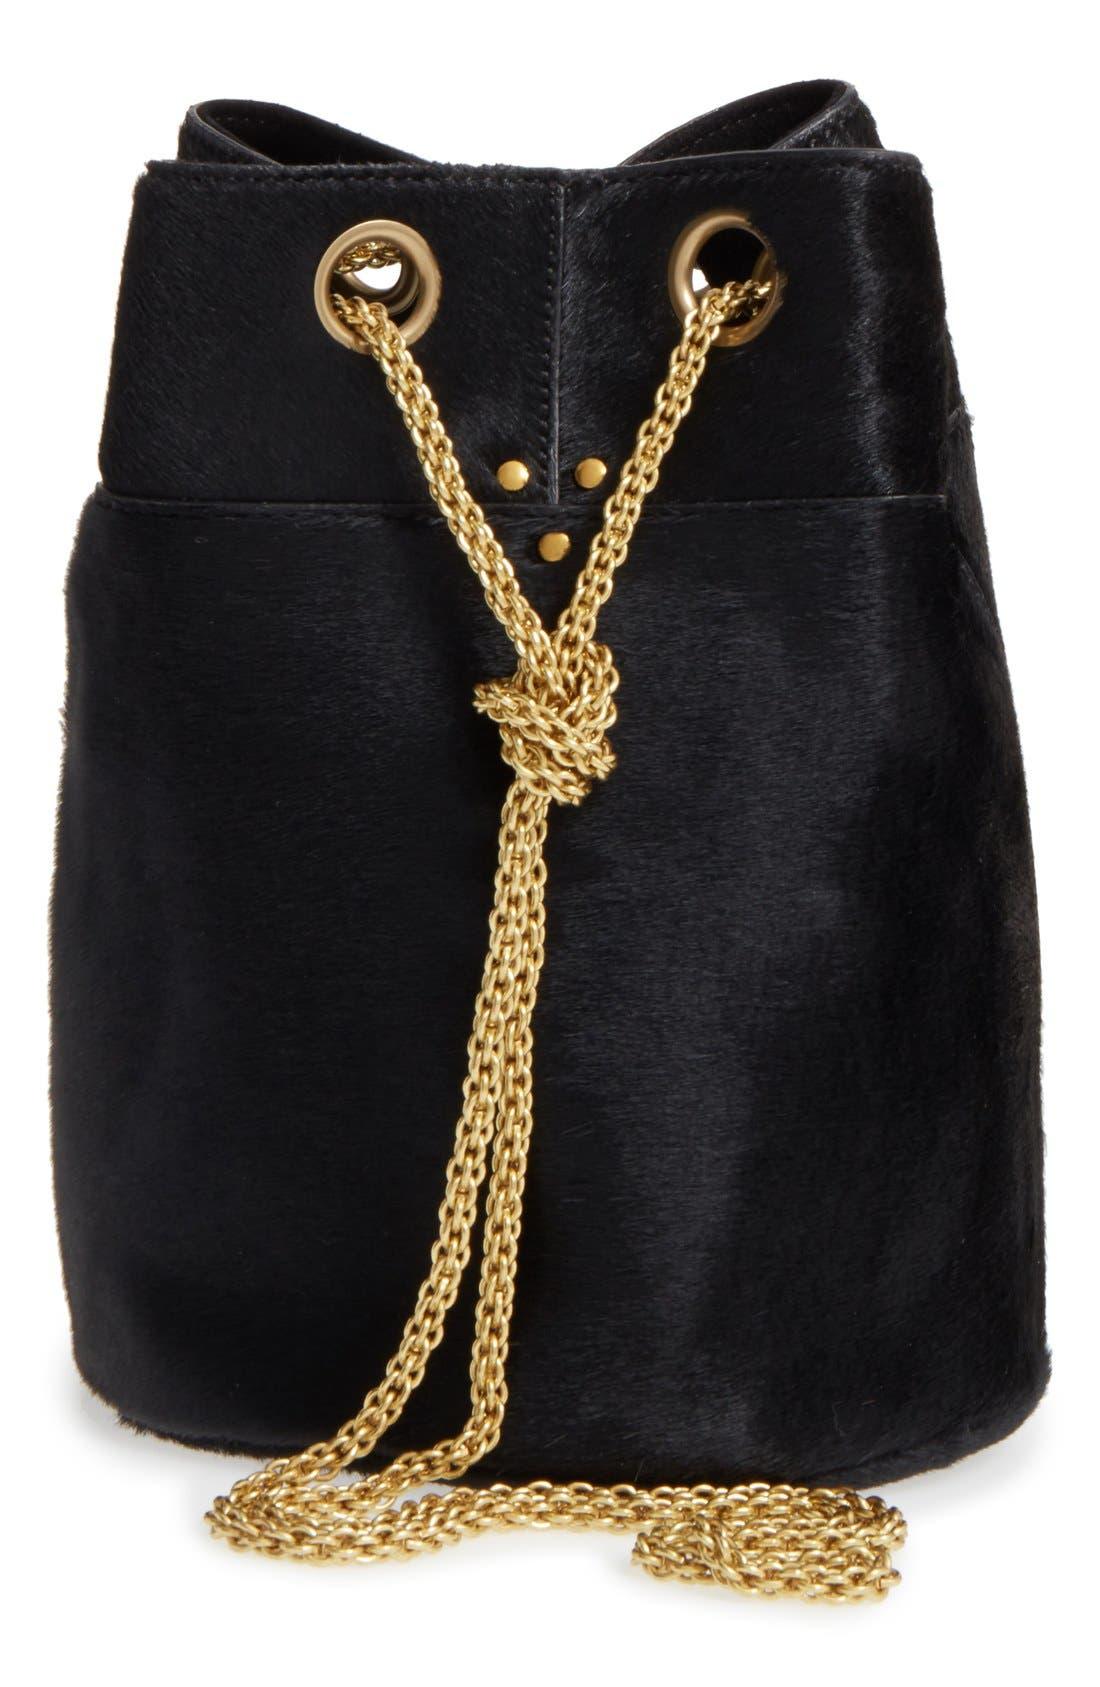 JEROME DREYFUSS 'Small Popeye' Genuine Calf Hair Bucket Bag, Main, color, 001